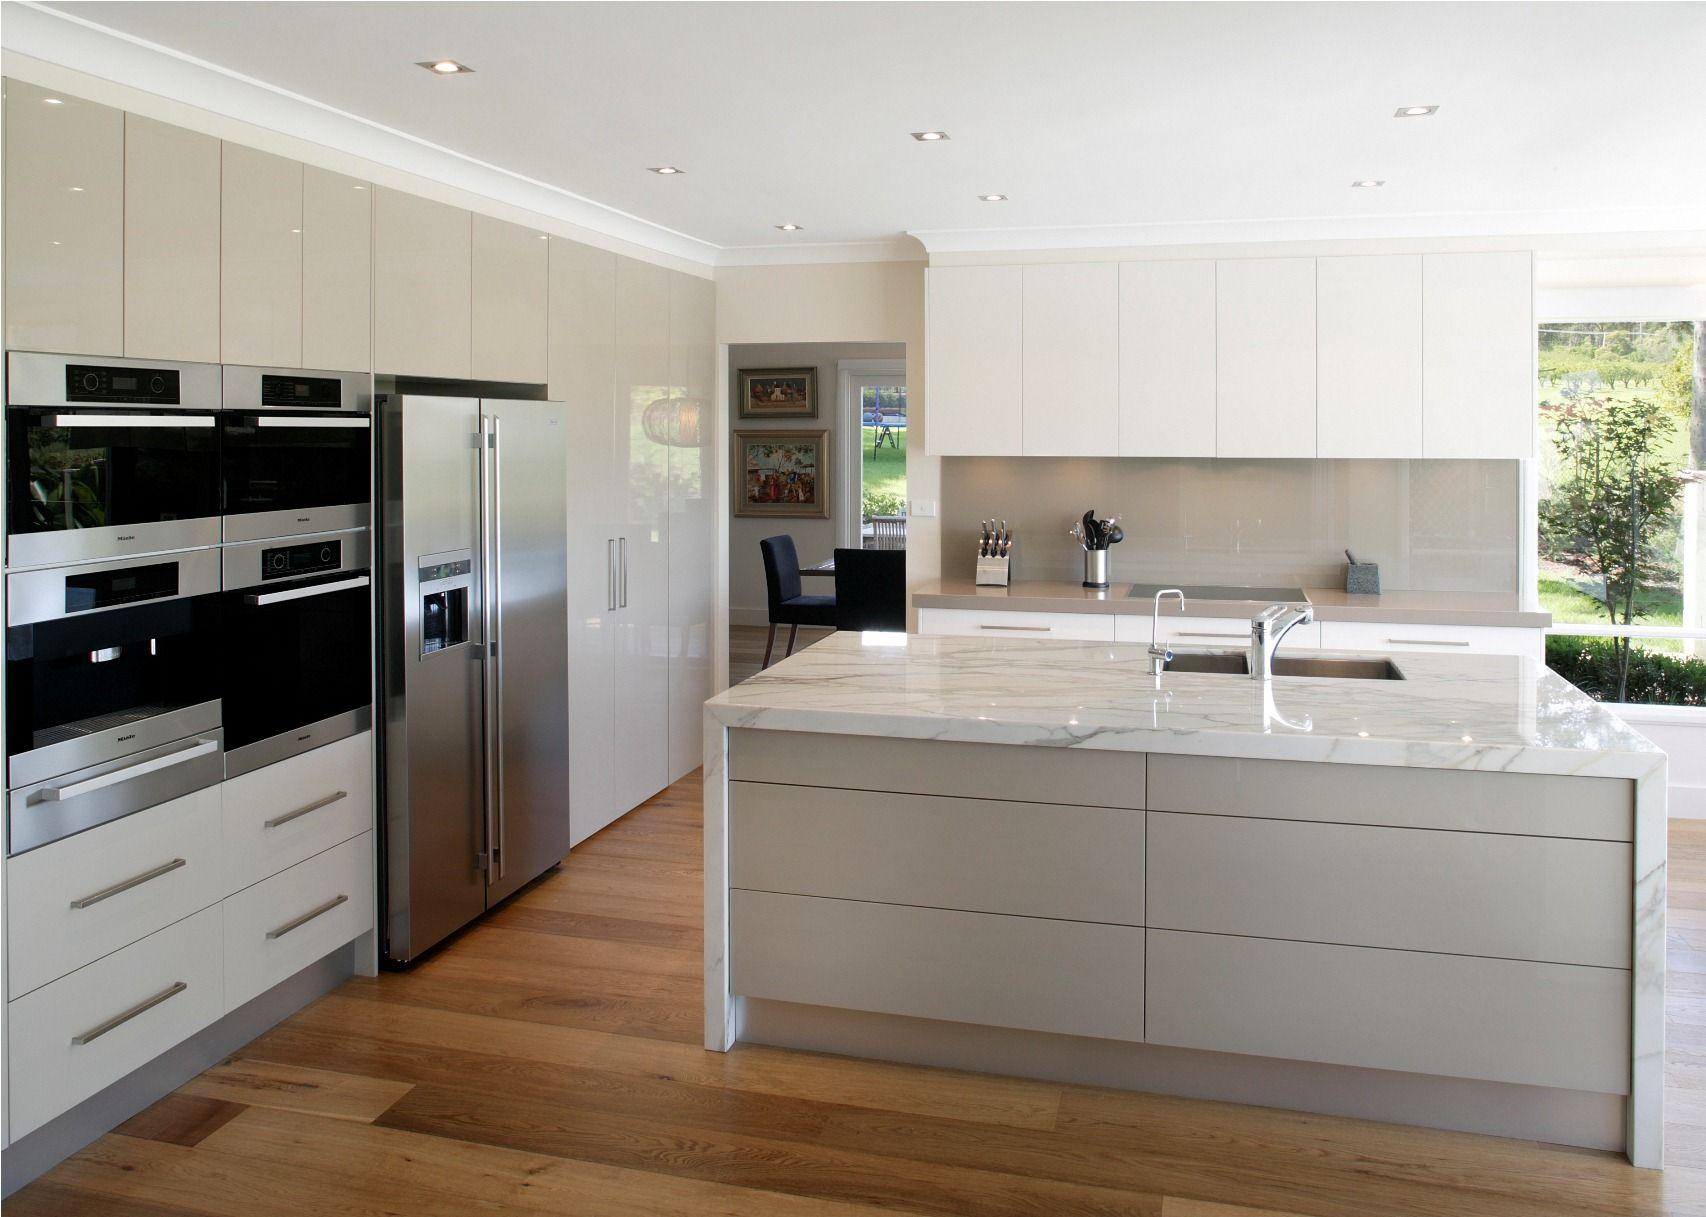 contemporary kitchen designs contemporary kitchen design 35 Modern Kitchen Design Inspiration